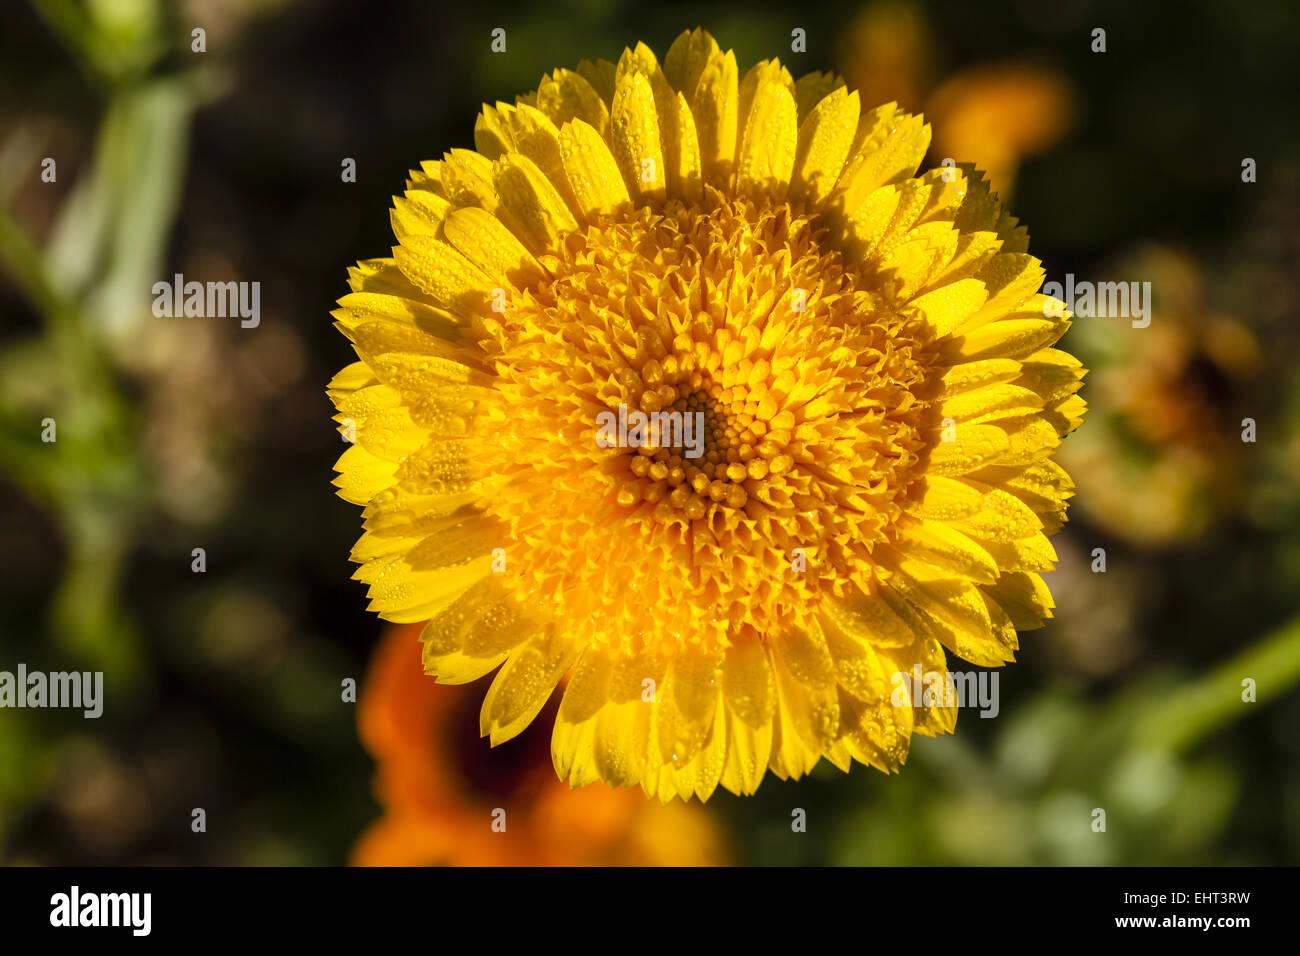 Marigold (Calendula officinalis) - Stock Image